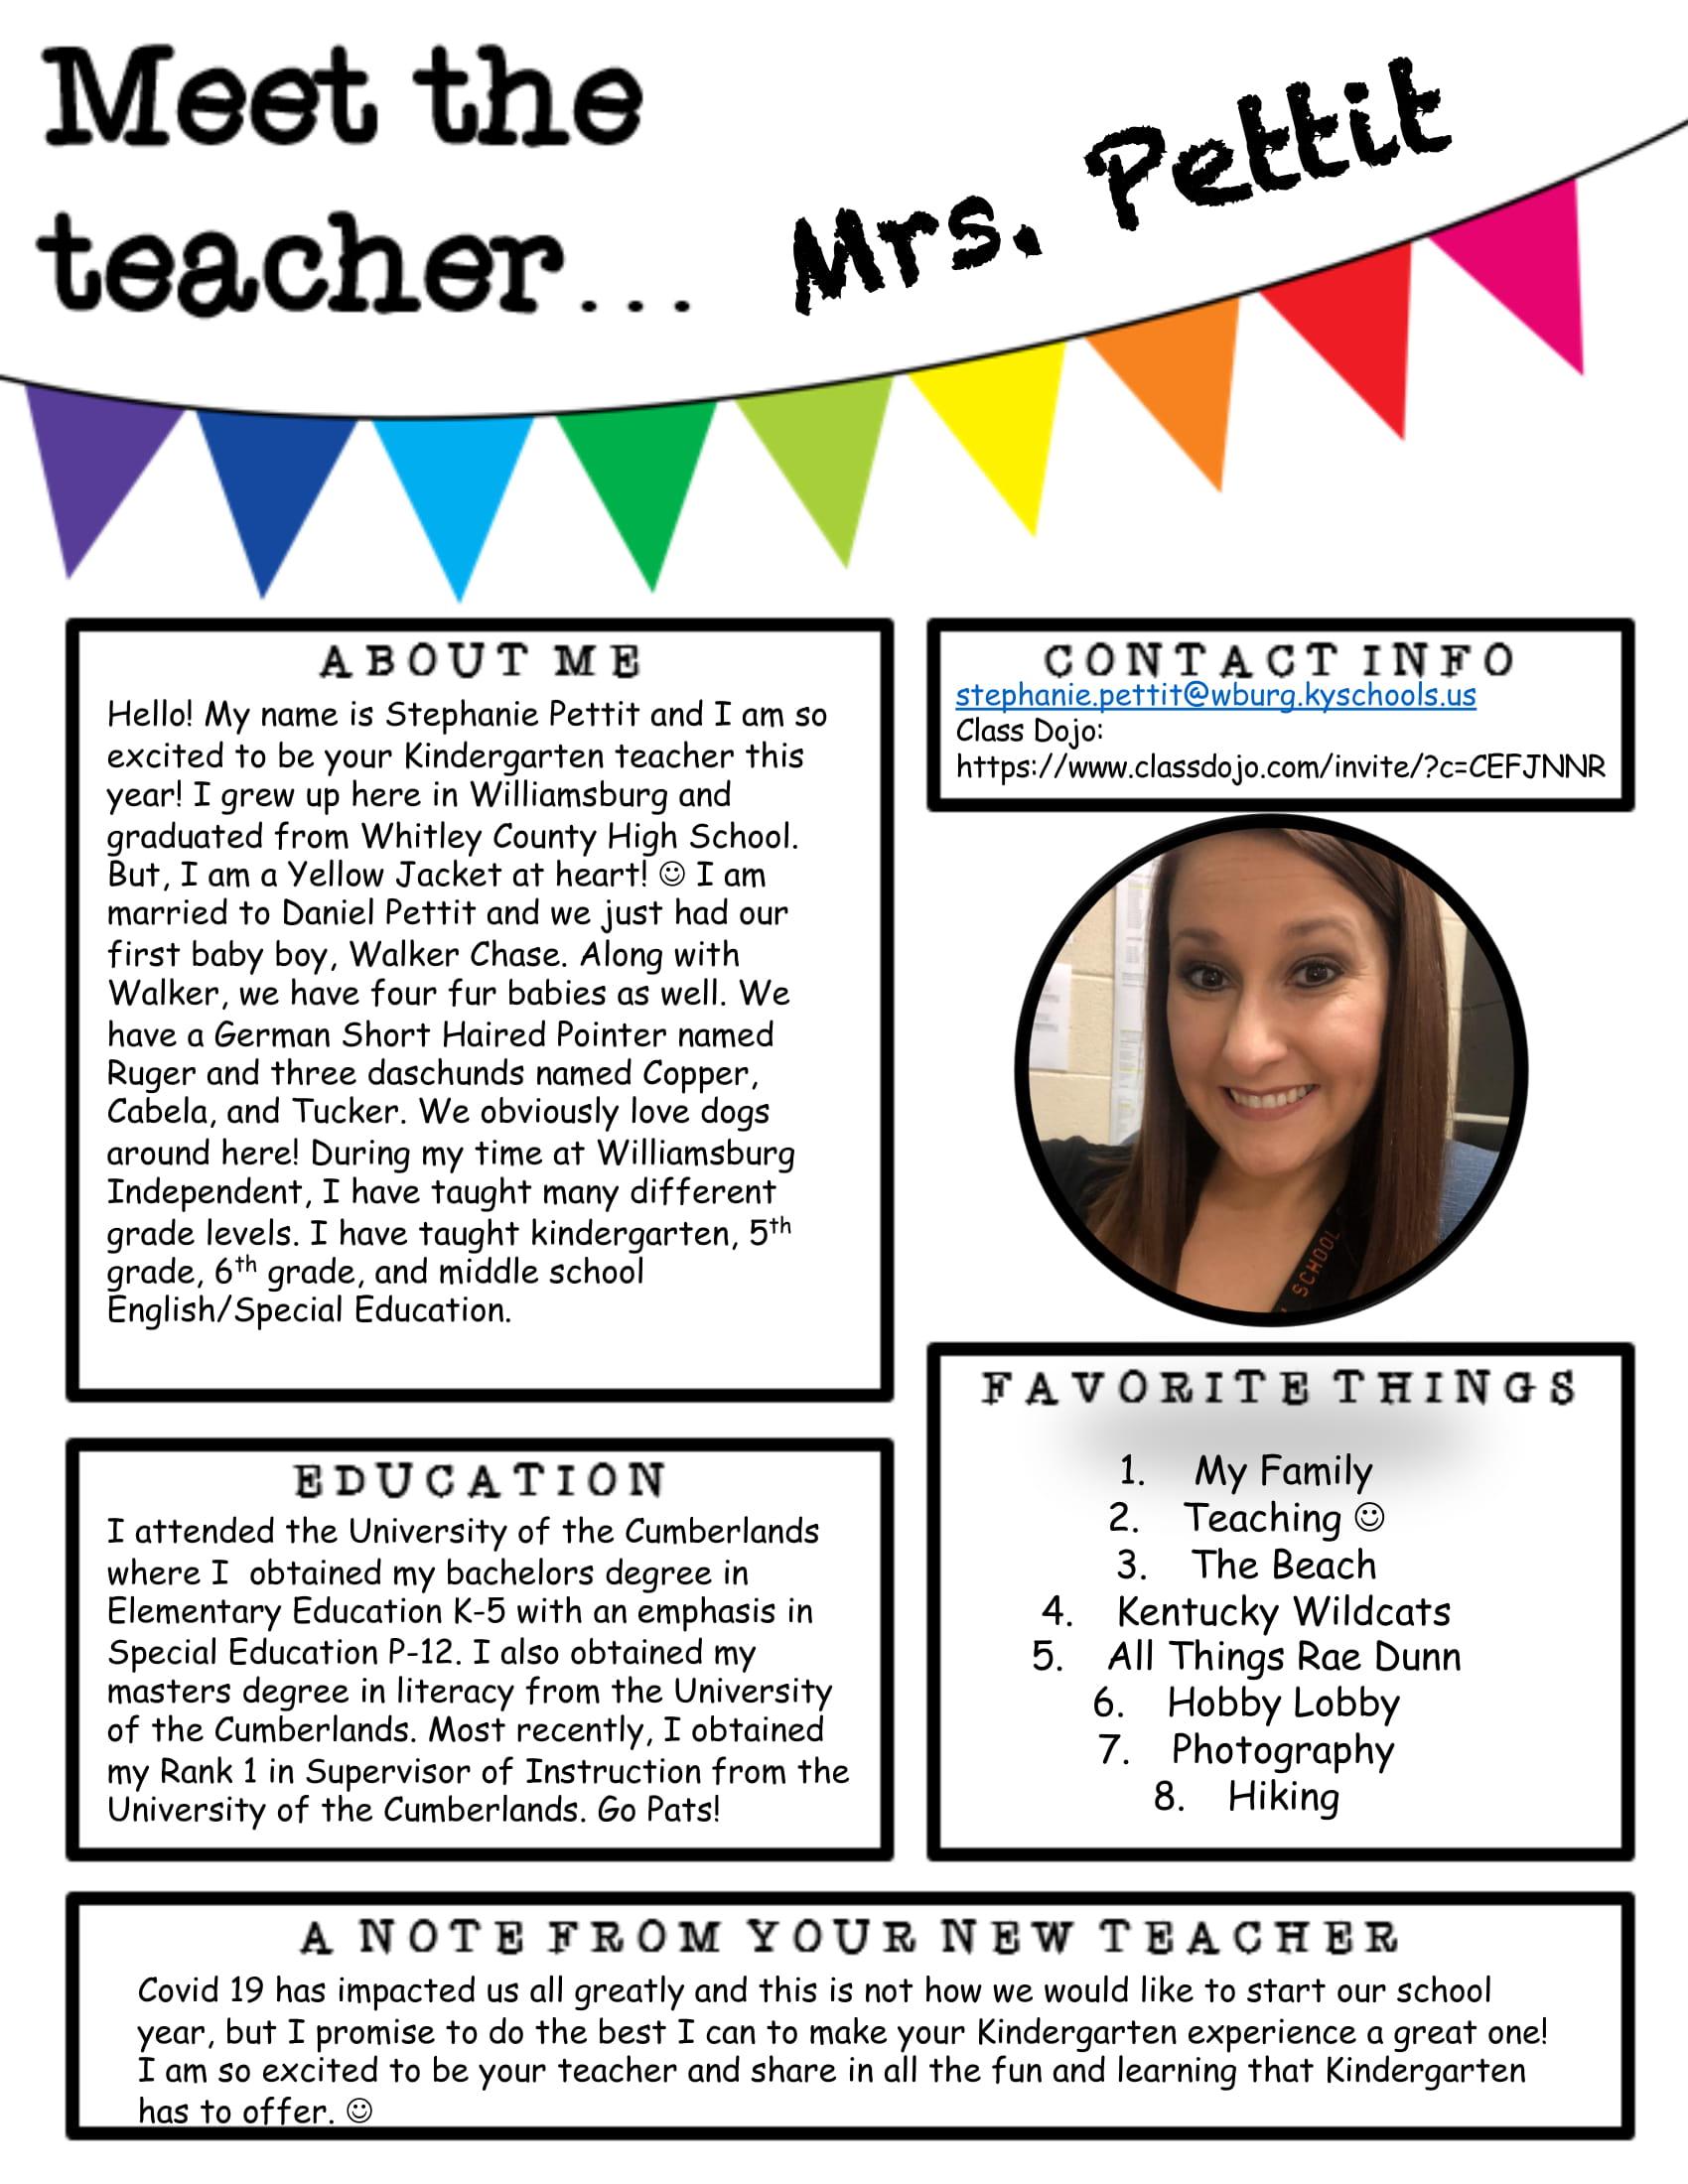 Meet Mrs. Pettit